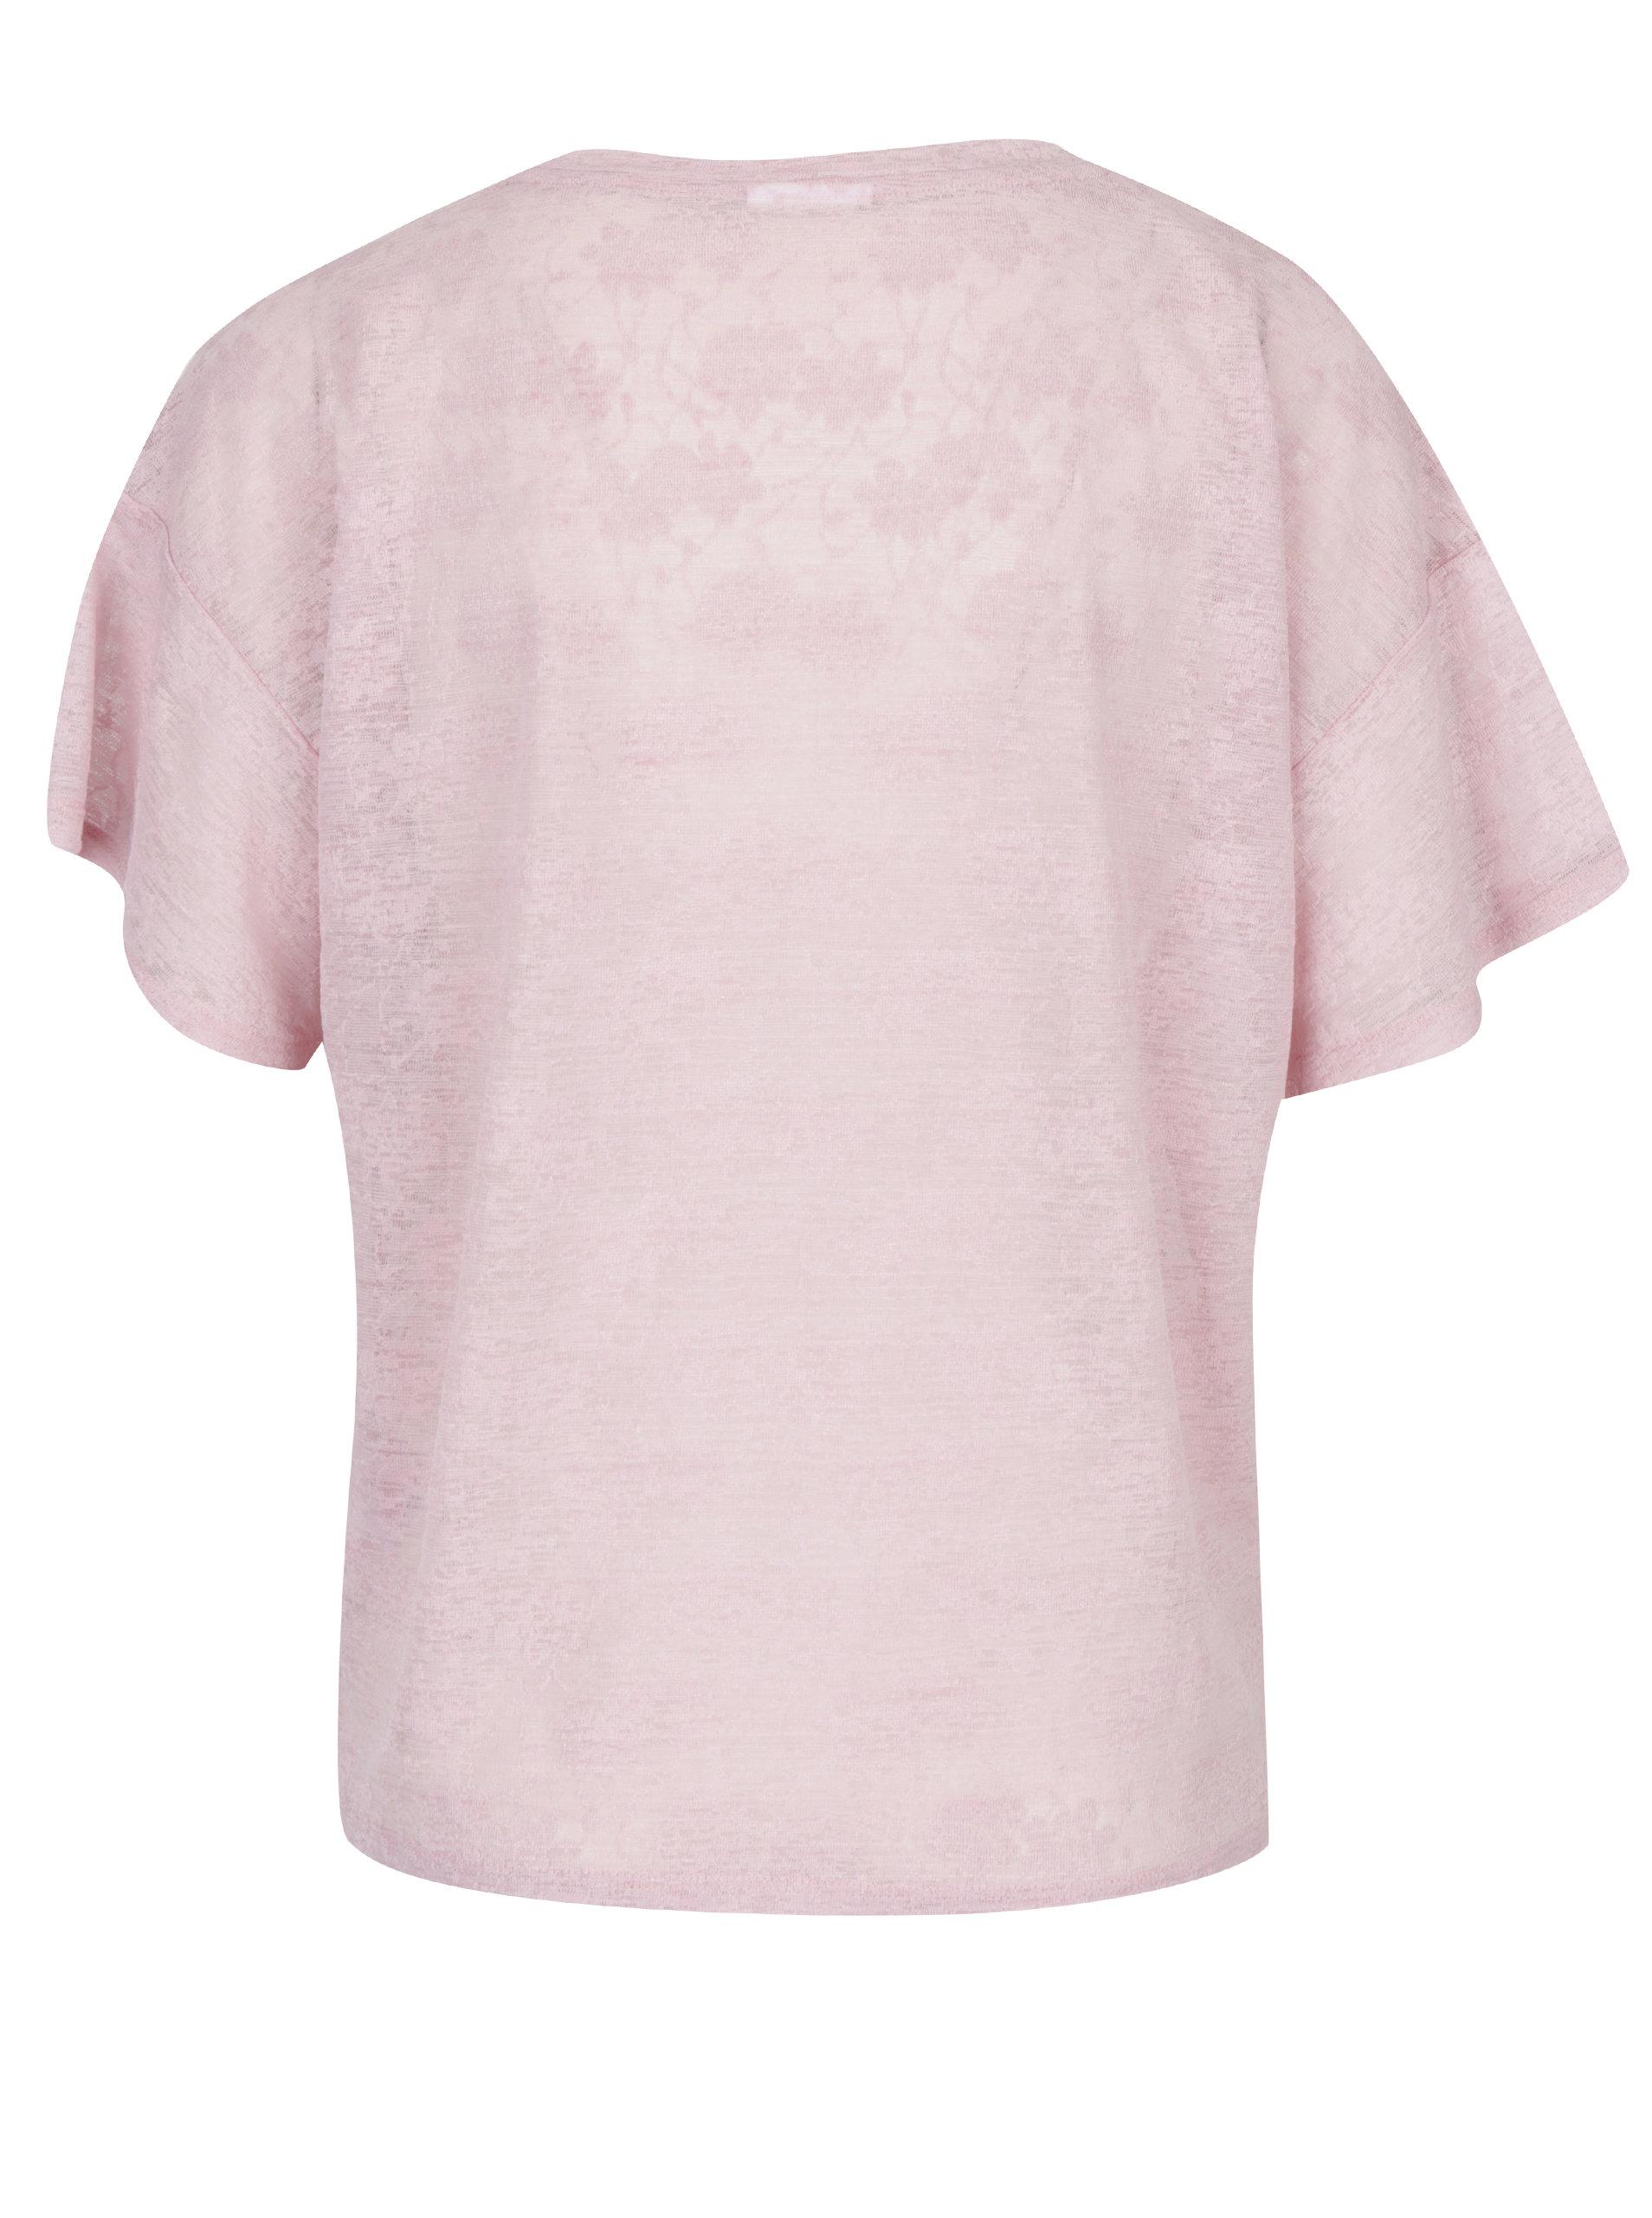 b0d3256b552 Růžové tričko s potiskem VILA Utti ...